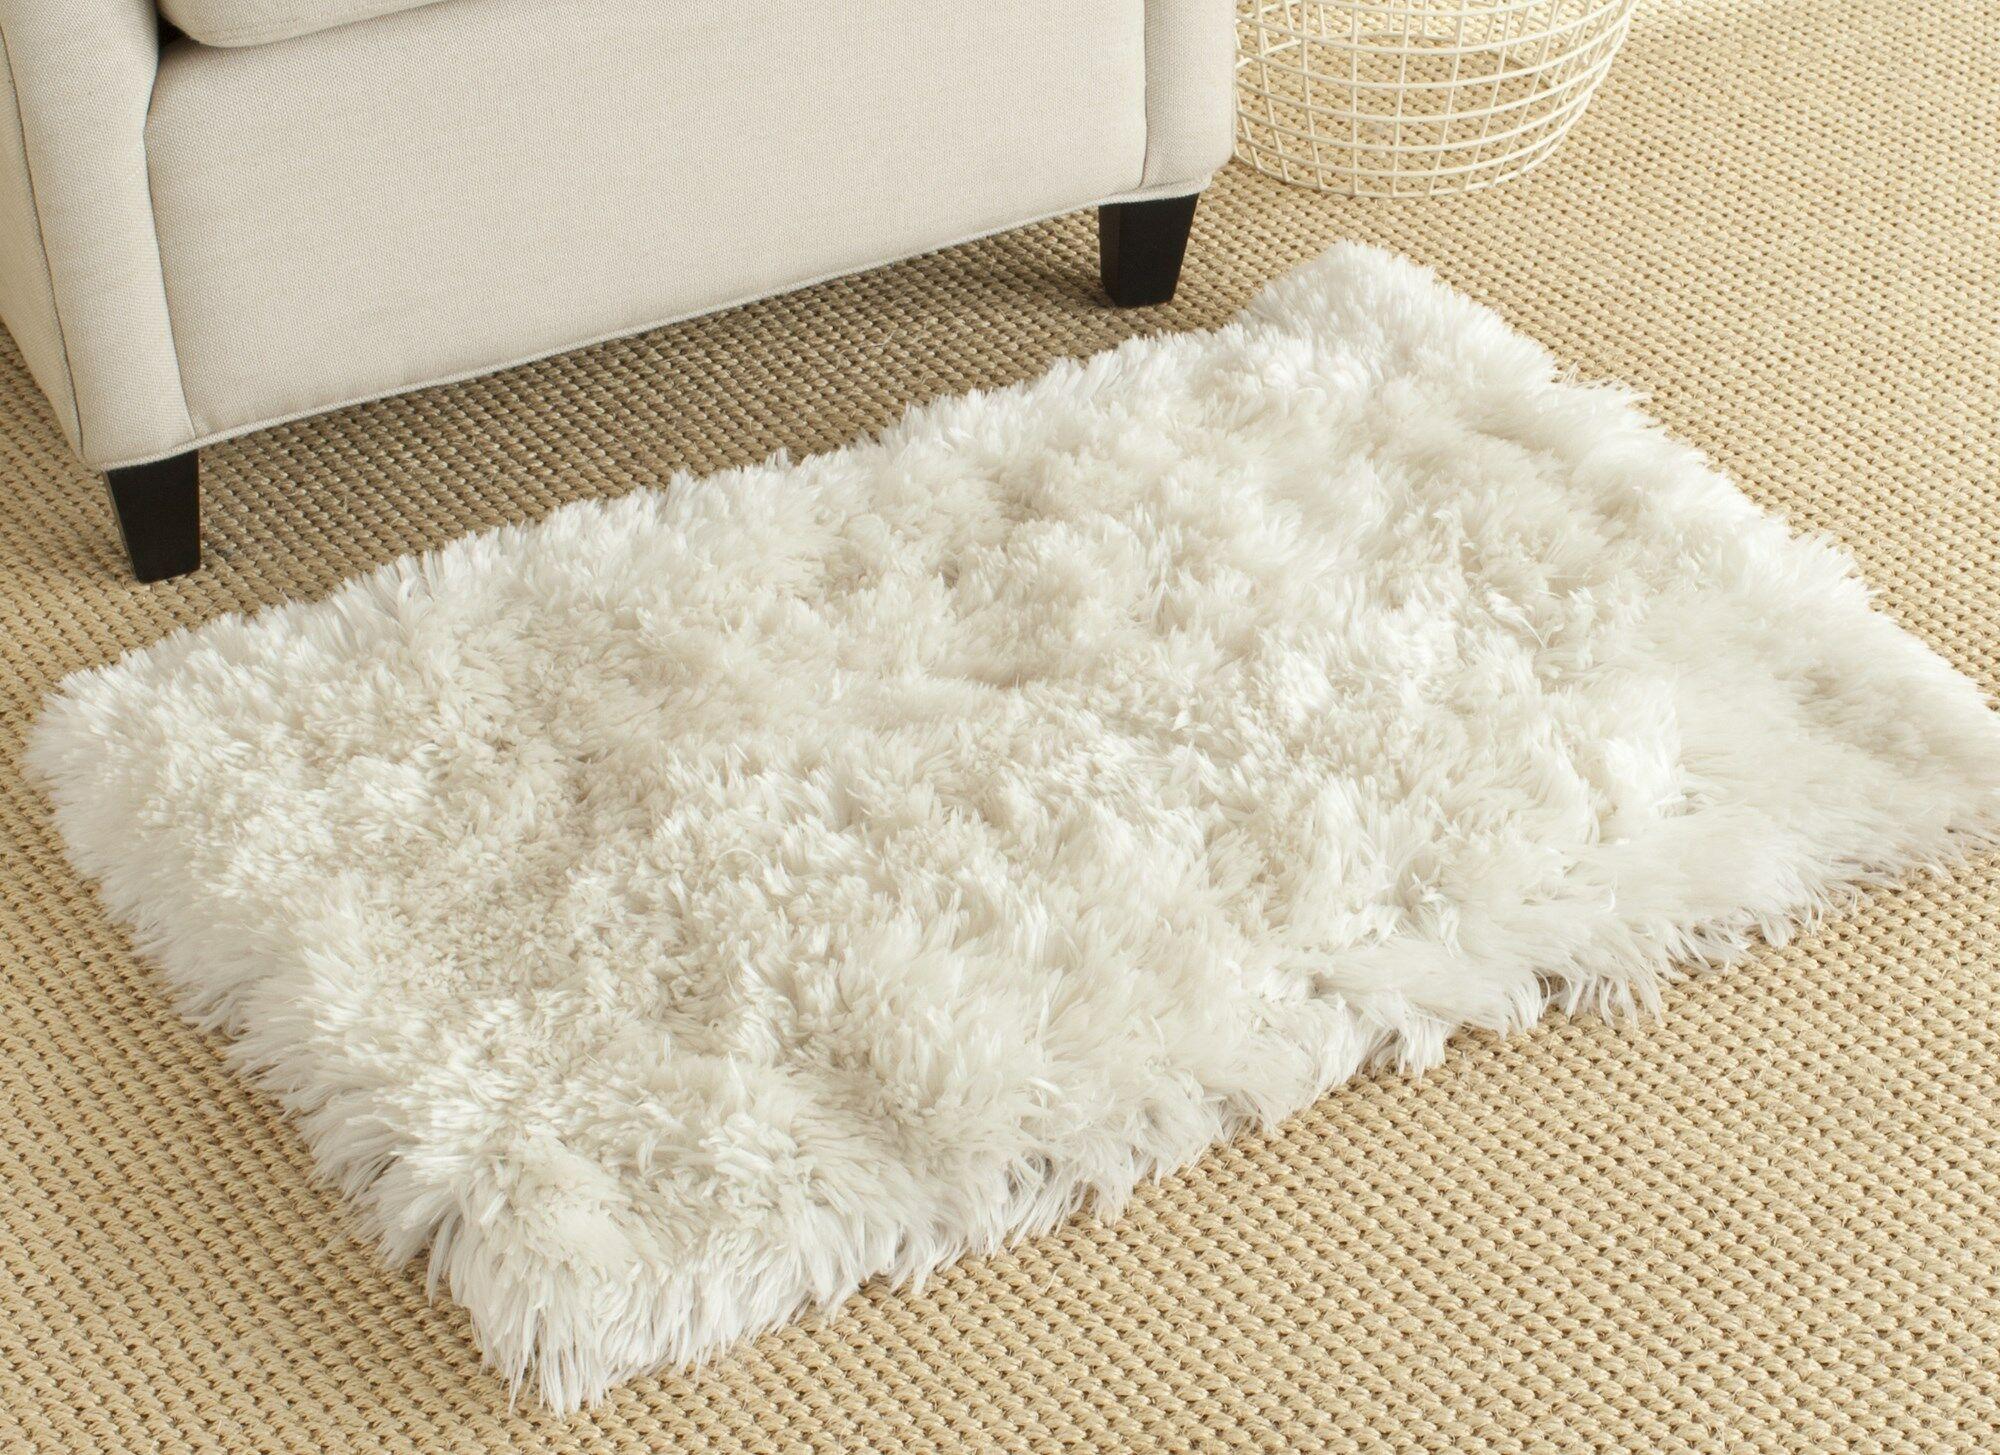 Hamlin Hand-Tufted White Area Rug Rug Size: Rectangle 4' X 6'